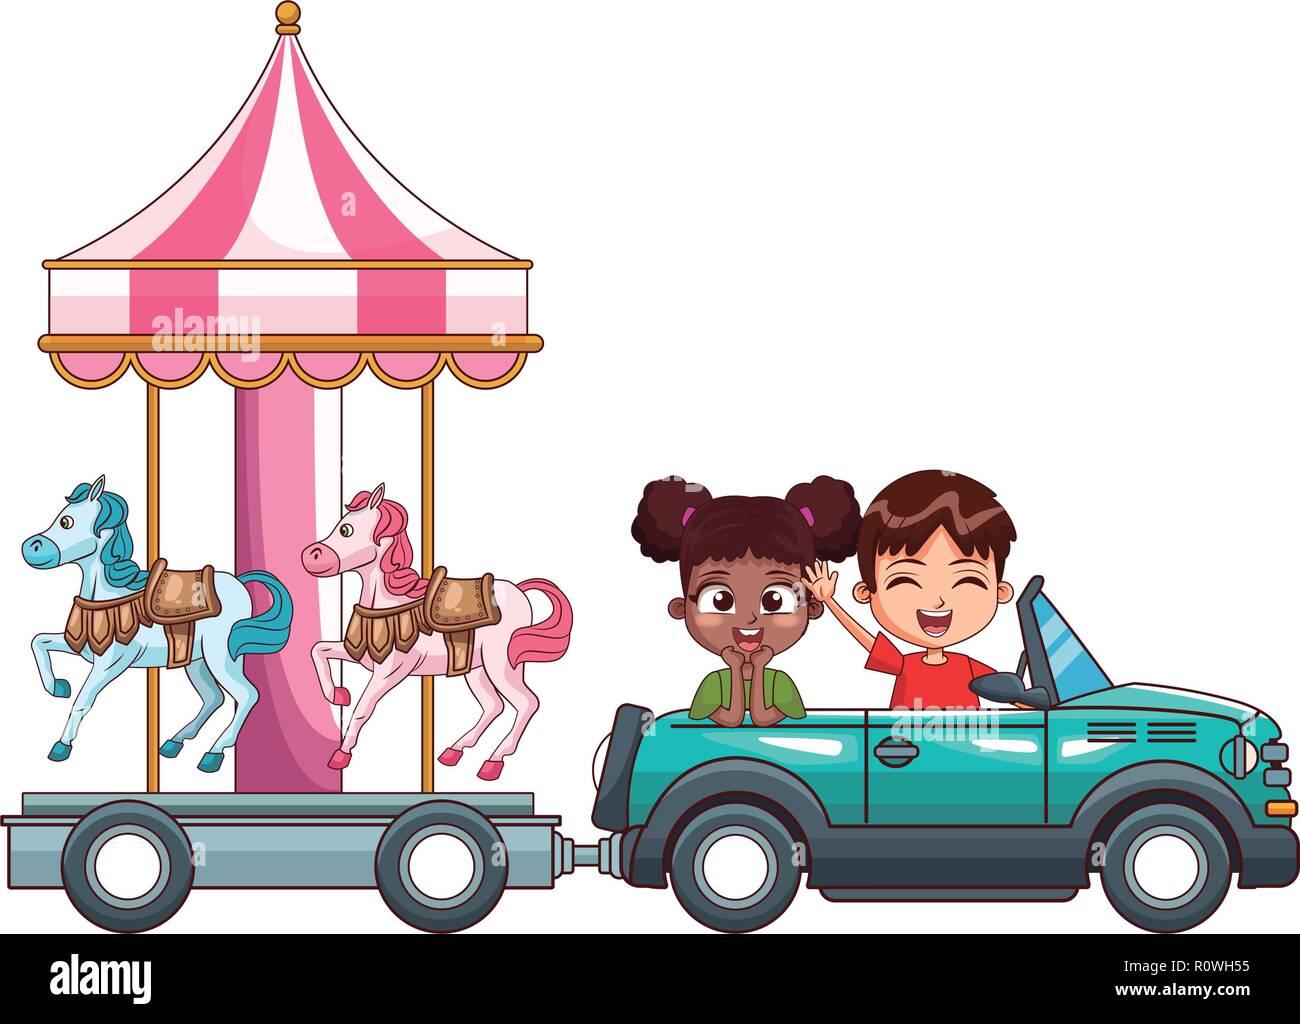 smiling kids driving car - Stock Image